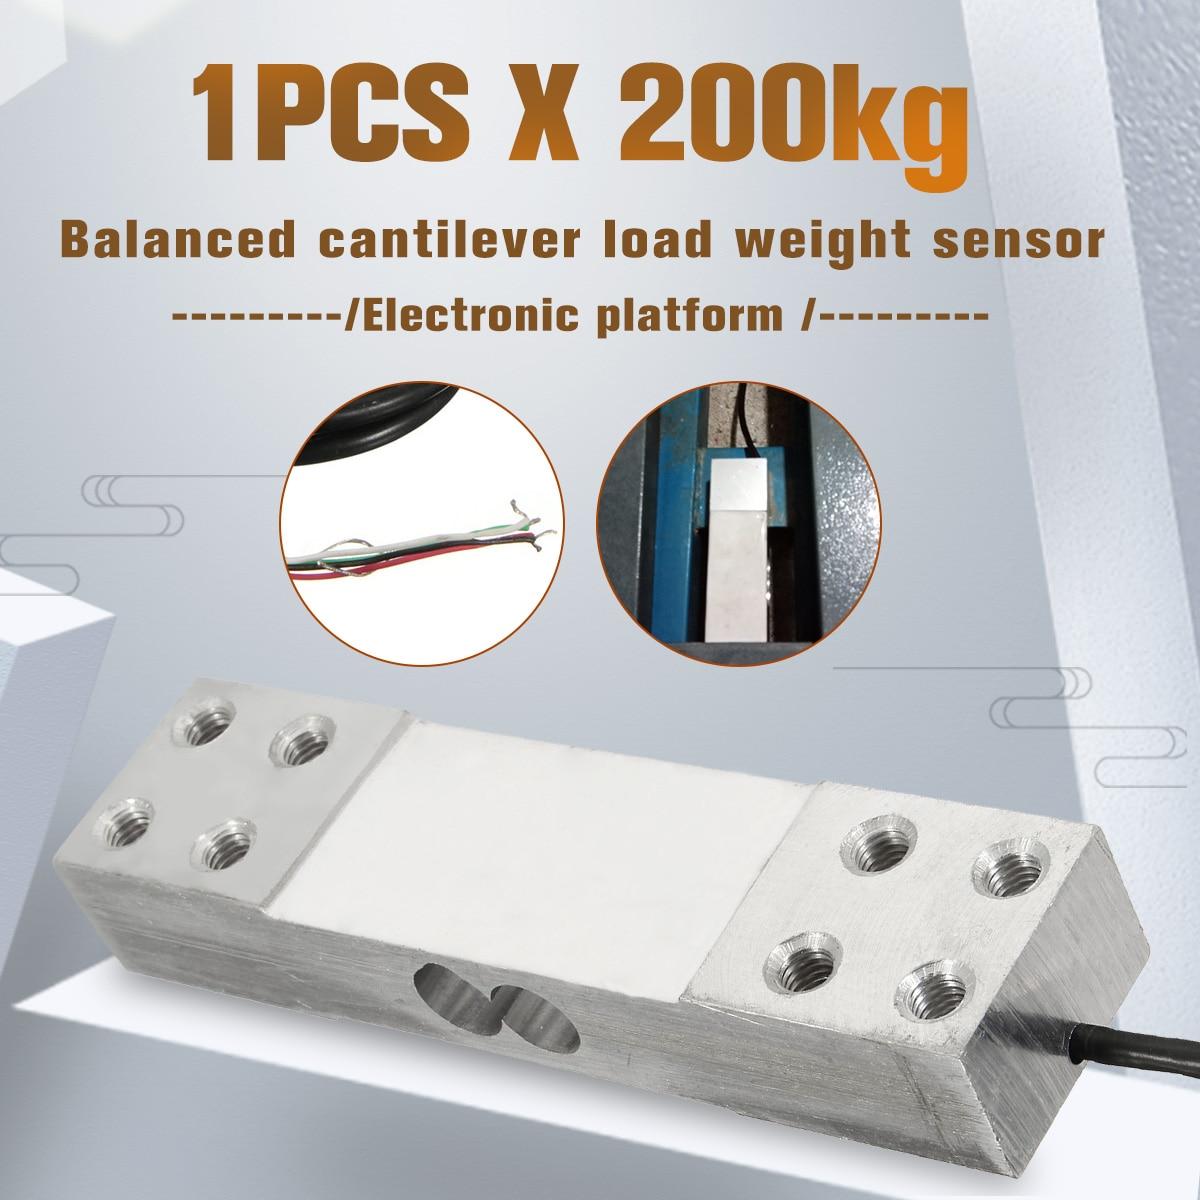 1pcs 200kg Electric Platform Scale Load Cells Pressure Sensor Cantilever Load Weight Sensor Measurement Tools New Arrival 2020